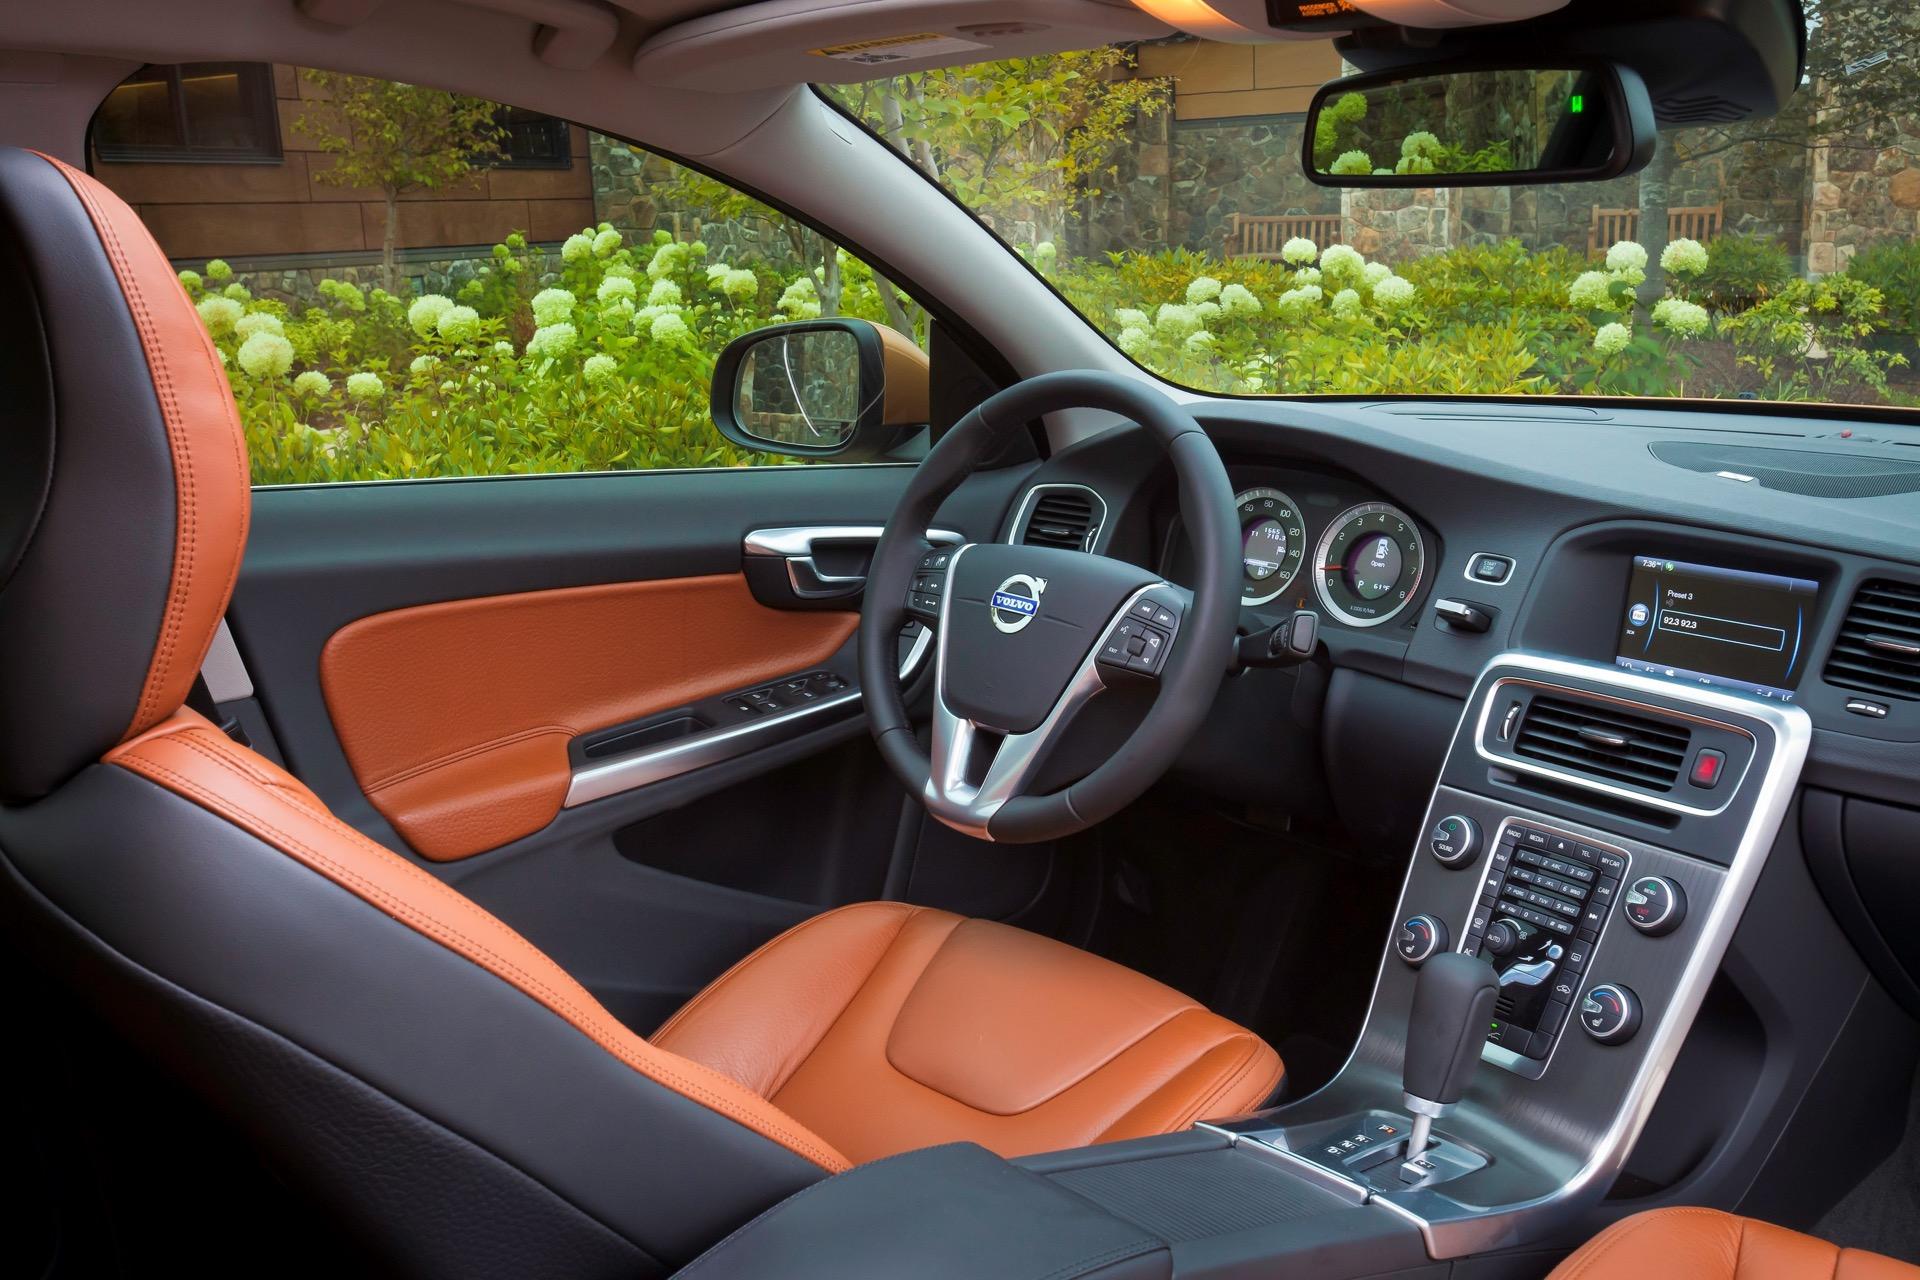 S60 T6 Awd Interior02 -  Volvo